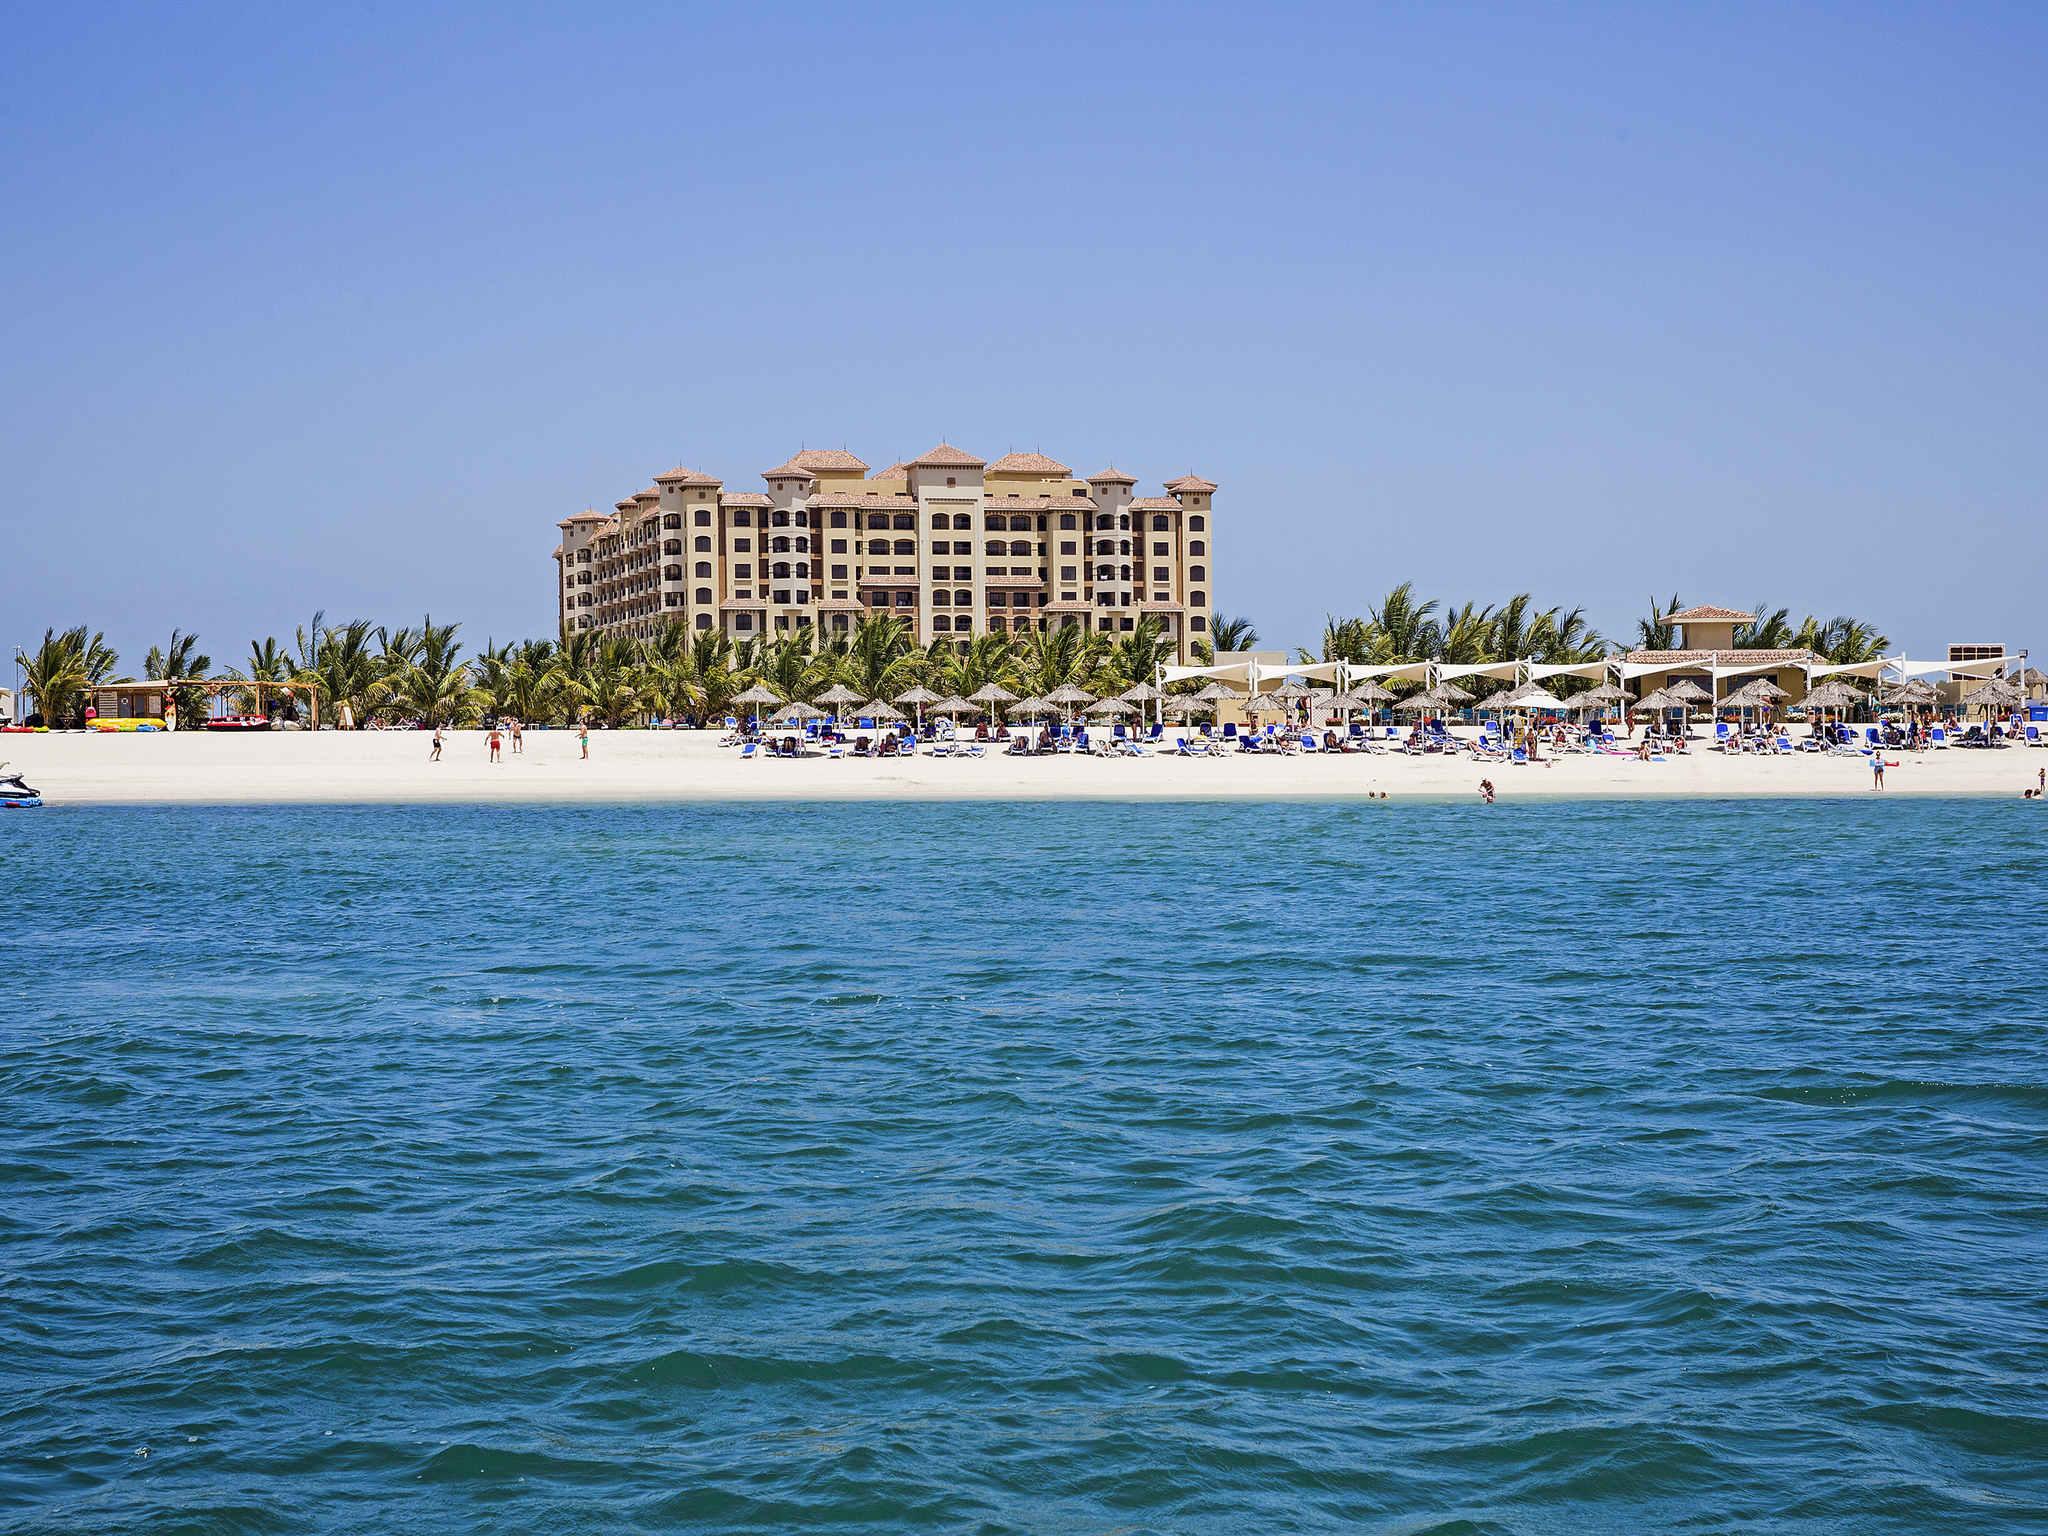 Hôtel - Marjan Island Resort & Spa - géré par AccorHotels